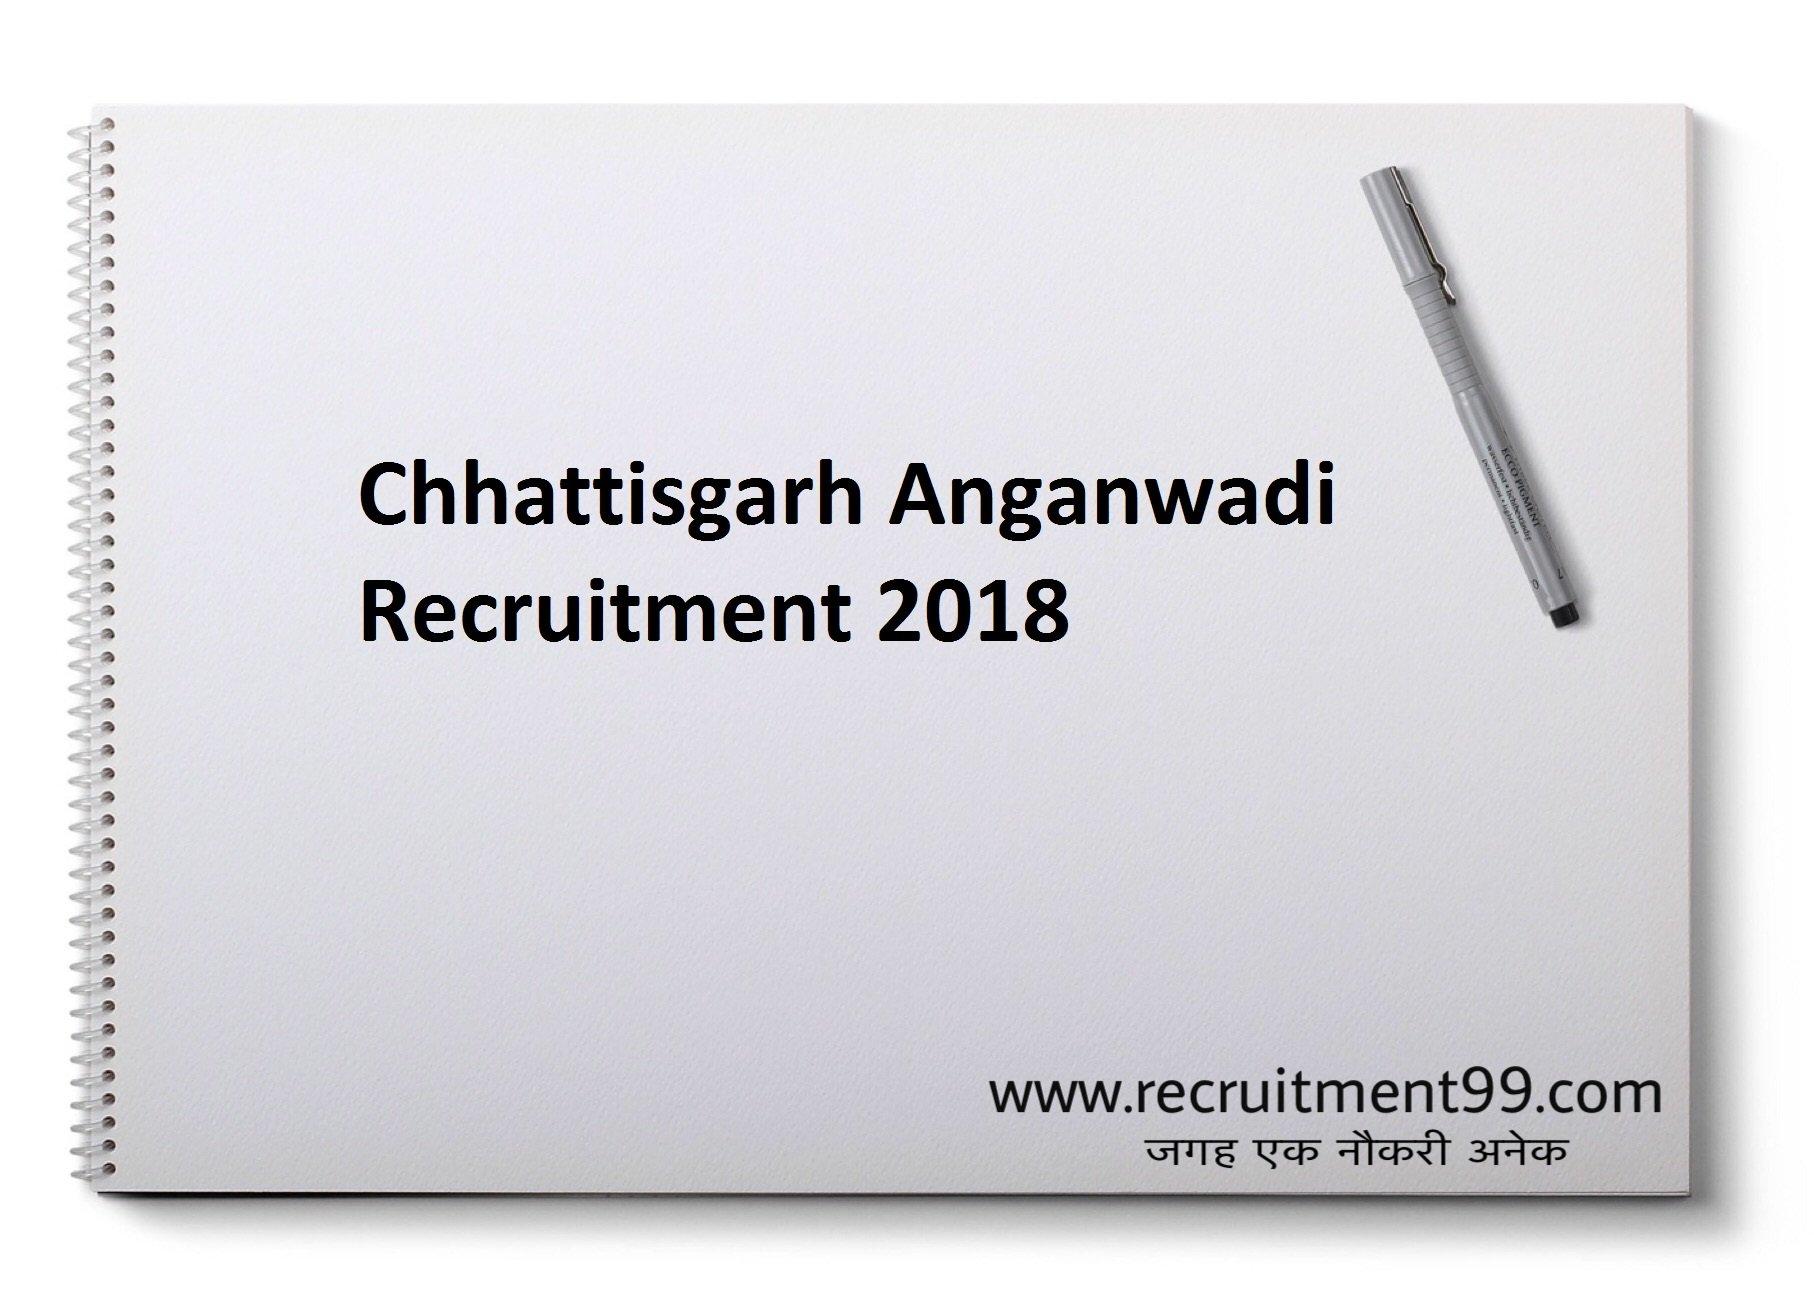 Chhattisgarh Angavwadi Helper, Worker & Supervisor Recruitment Admit Card Result 2018